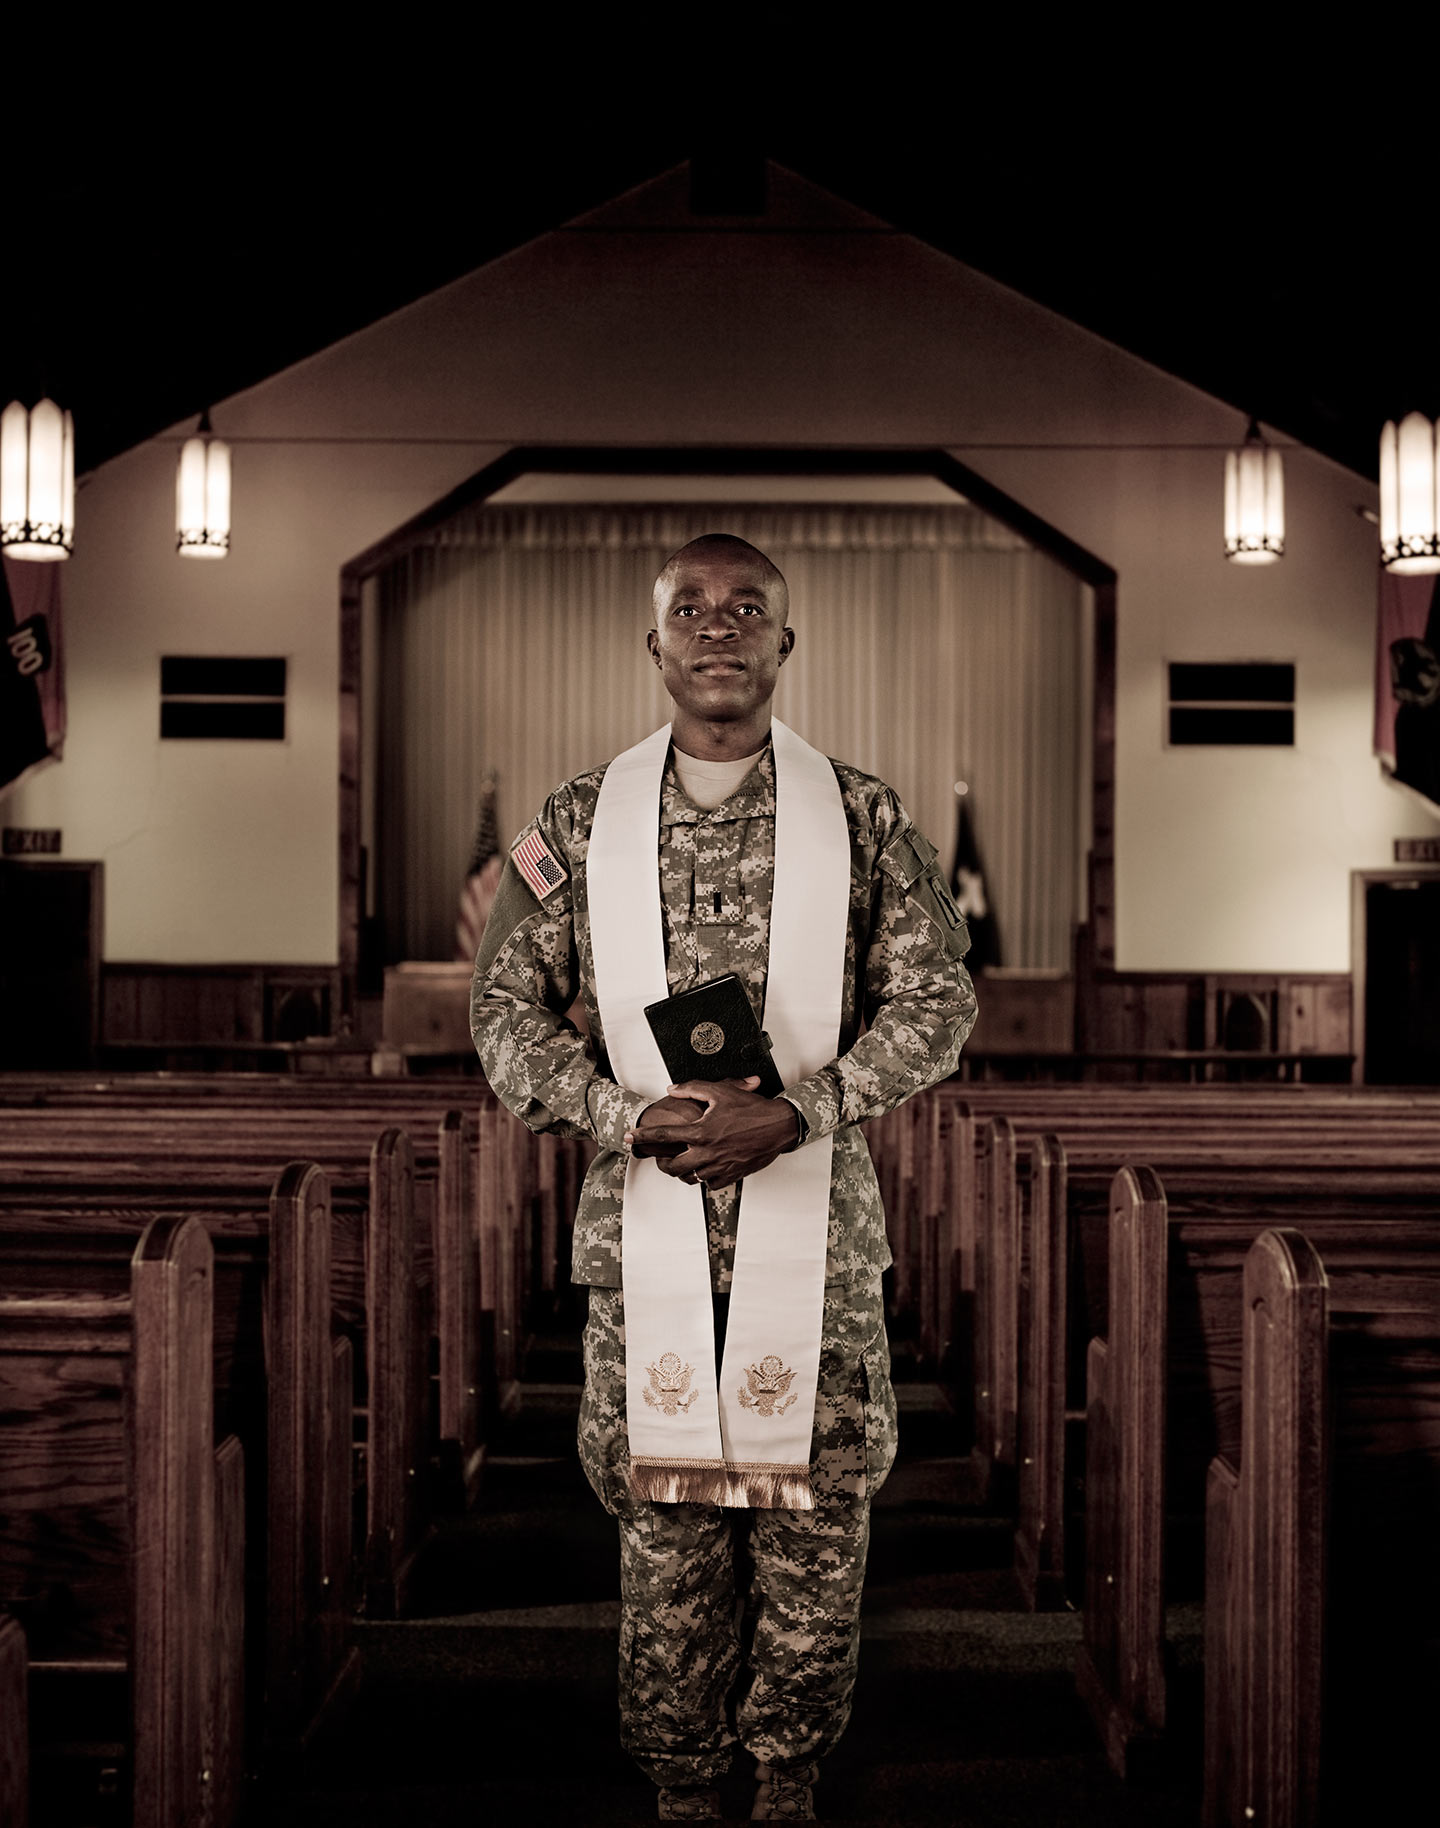 G_RodMcLean_Army_Chaplain_korie